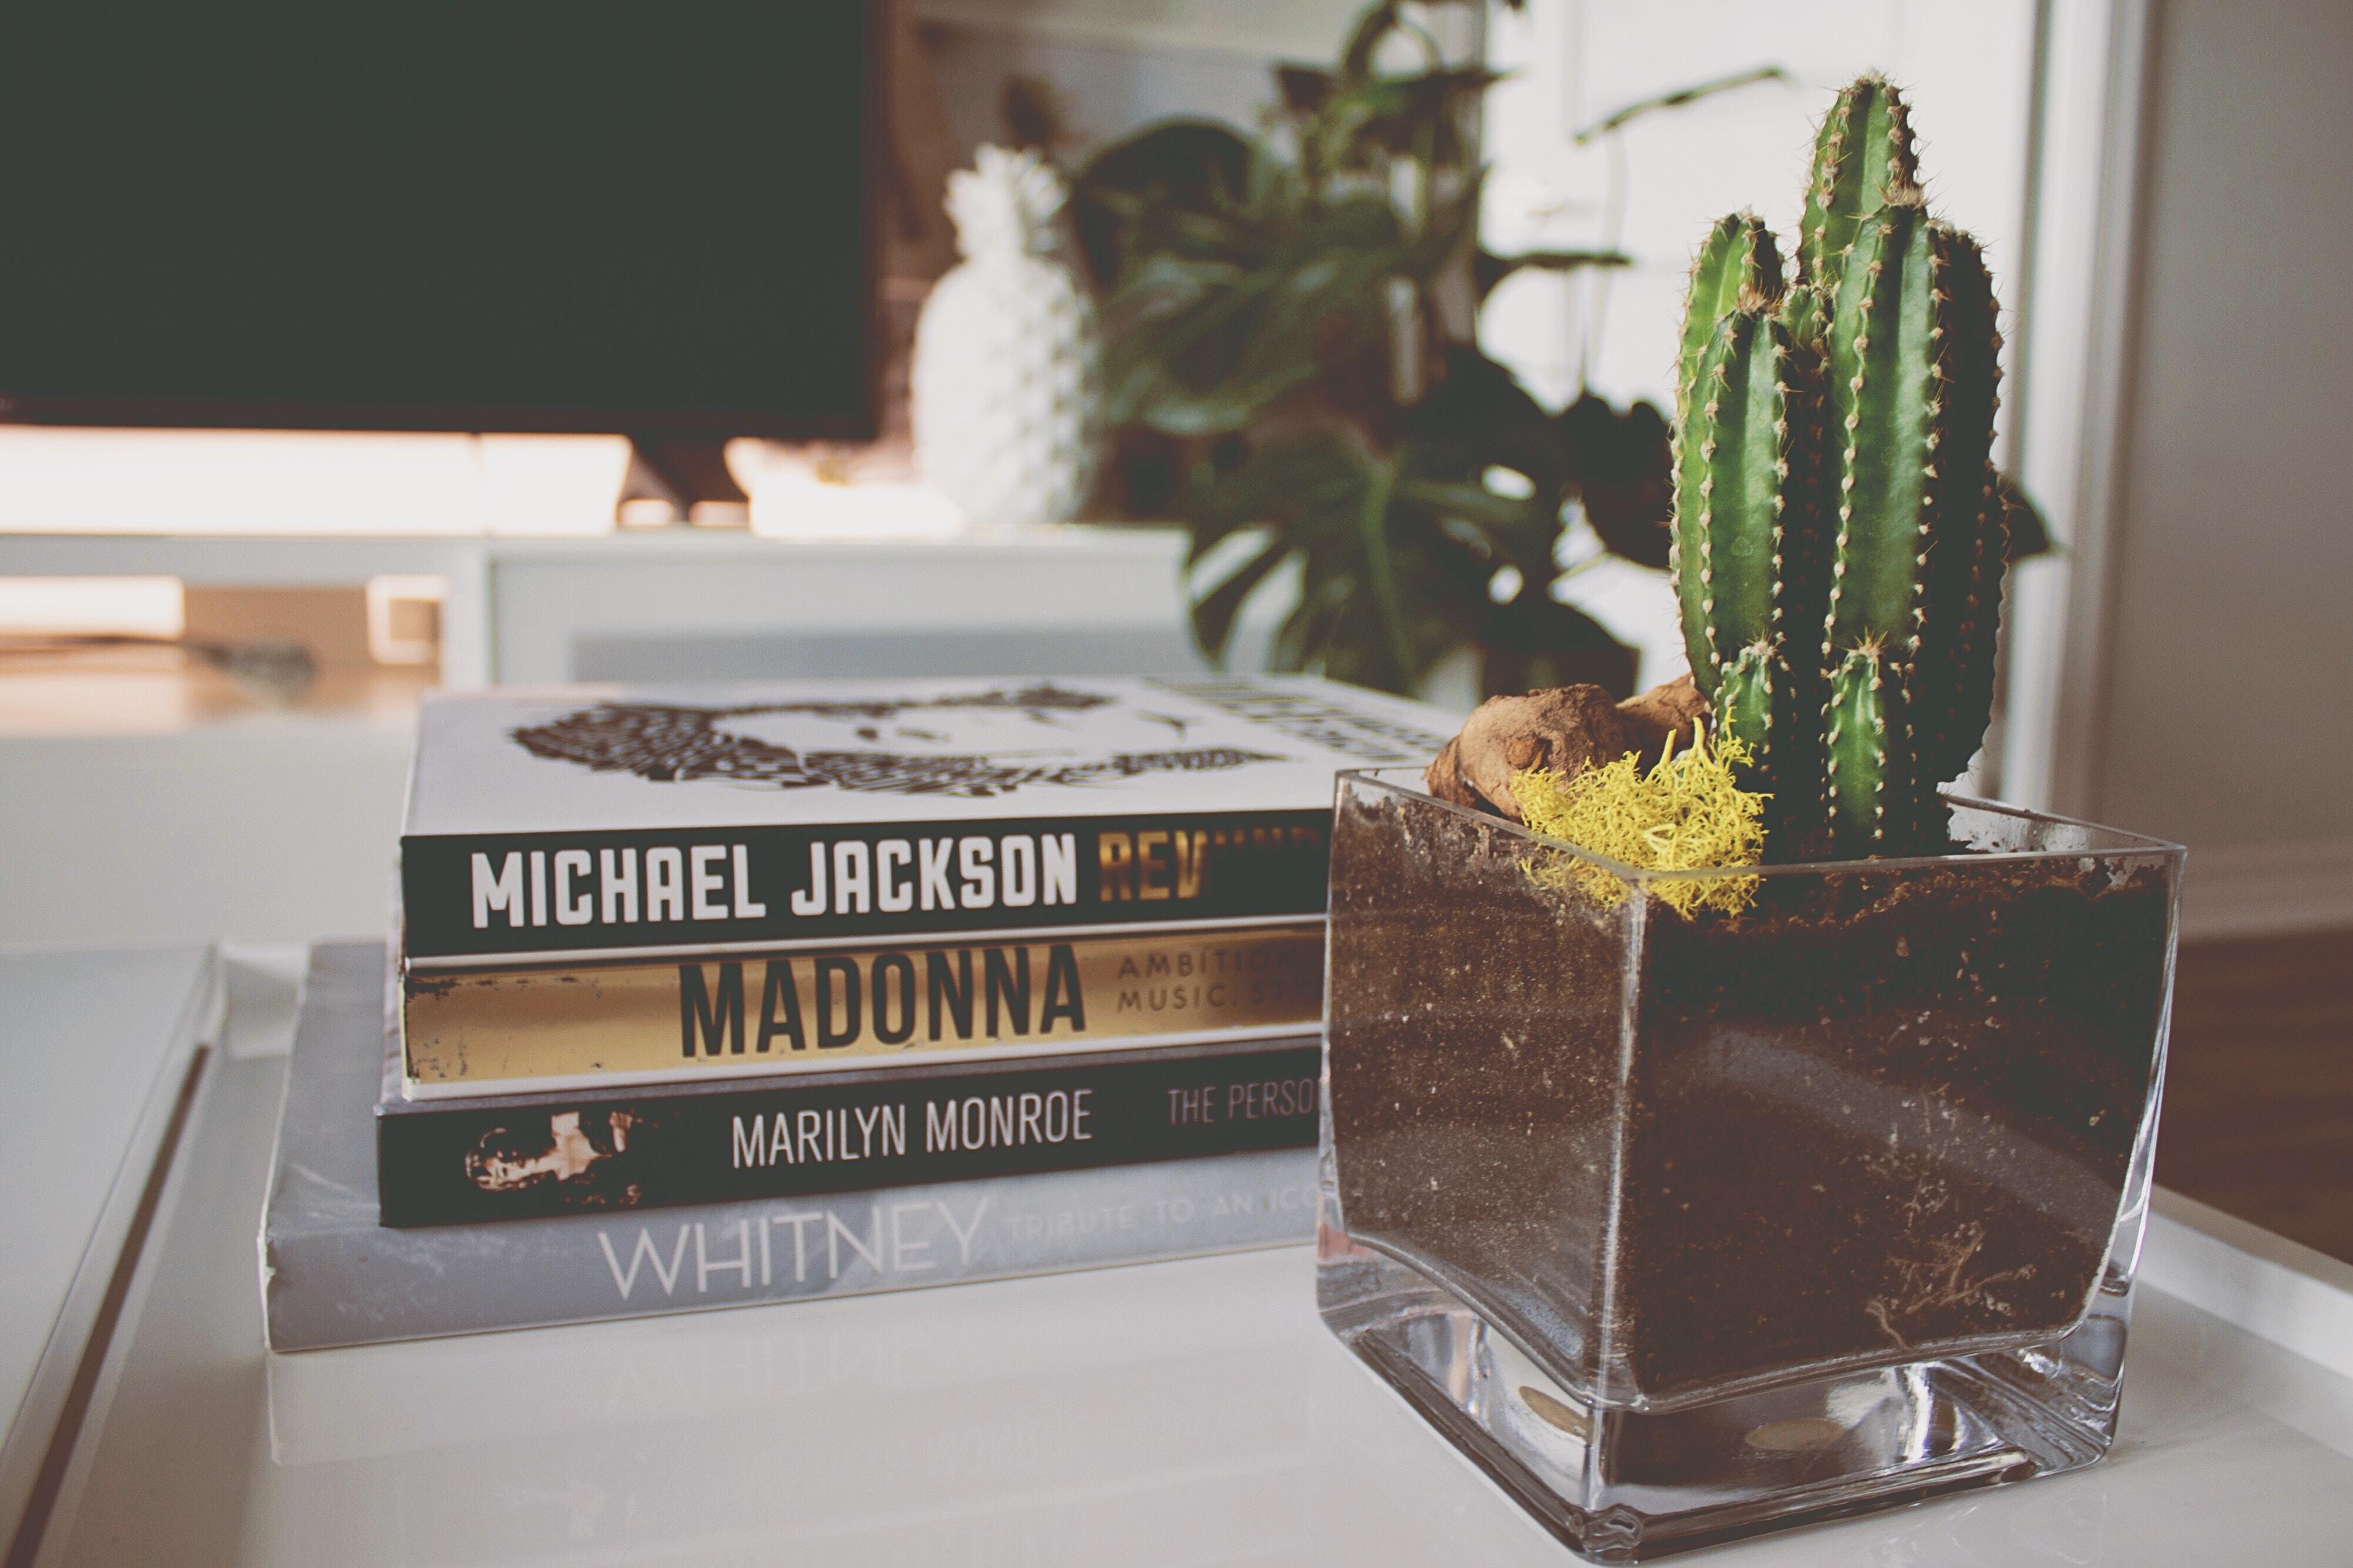 cactus near four novel books